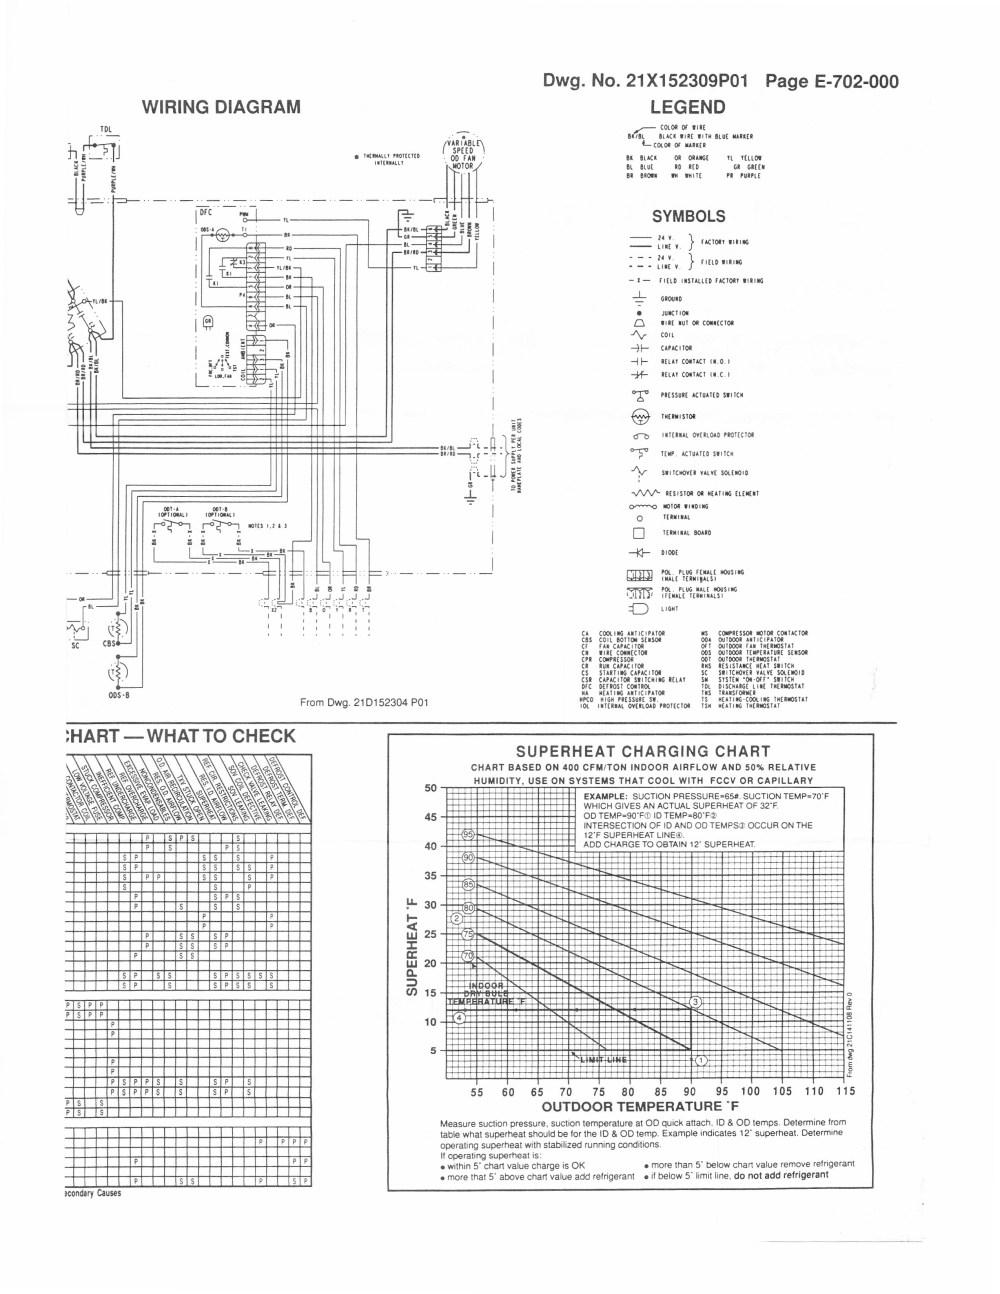 medium resolution of trane ycd120 wiring diagram wiring diagram m6 can you send me a wiring diagram for trane